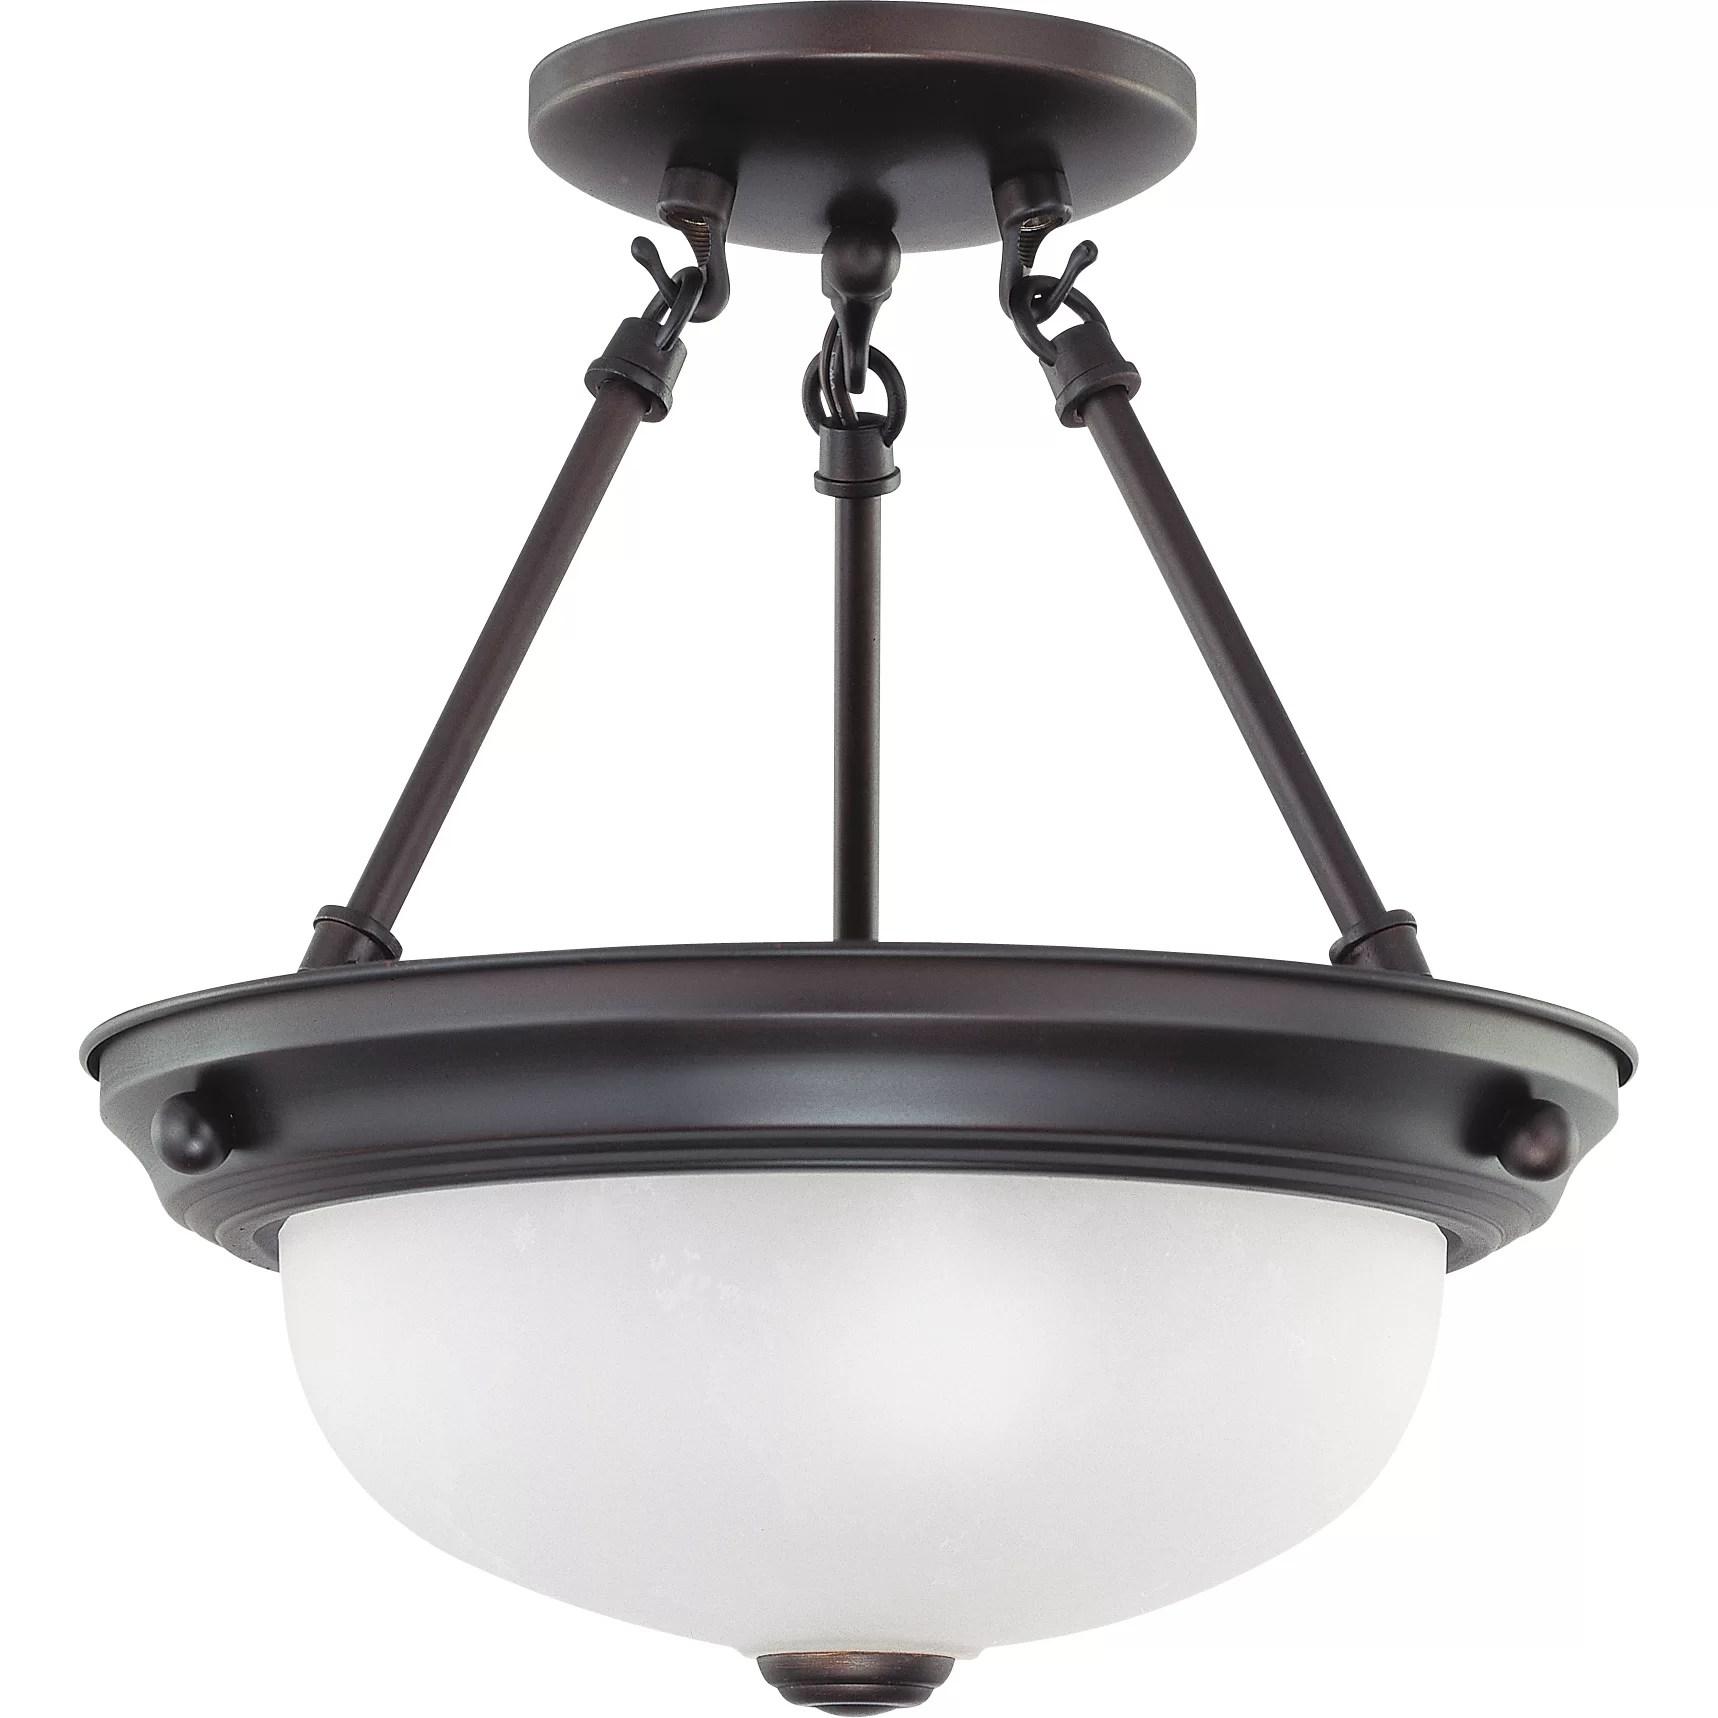 Nuvo Lighting 2 Light Semi Flush Mount & Reviews